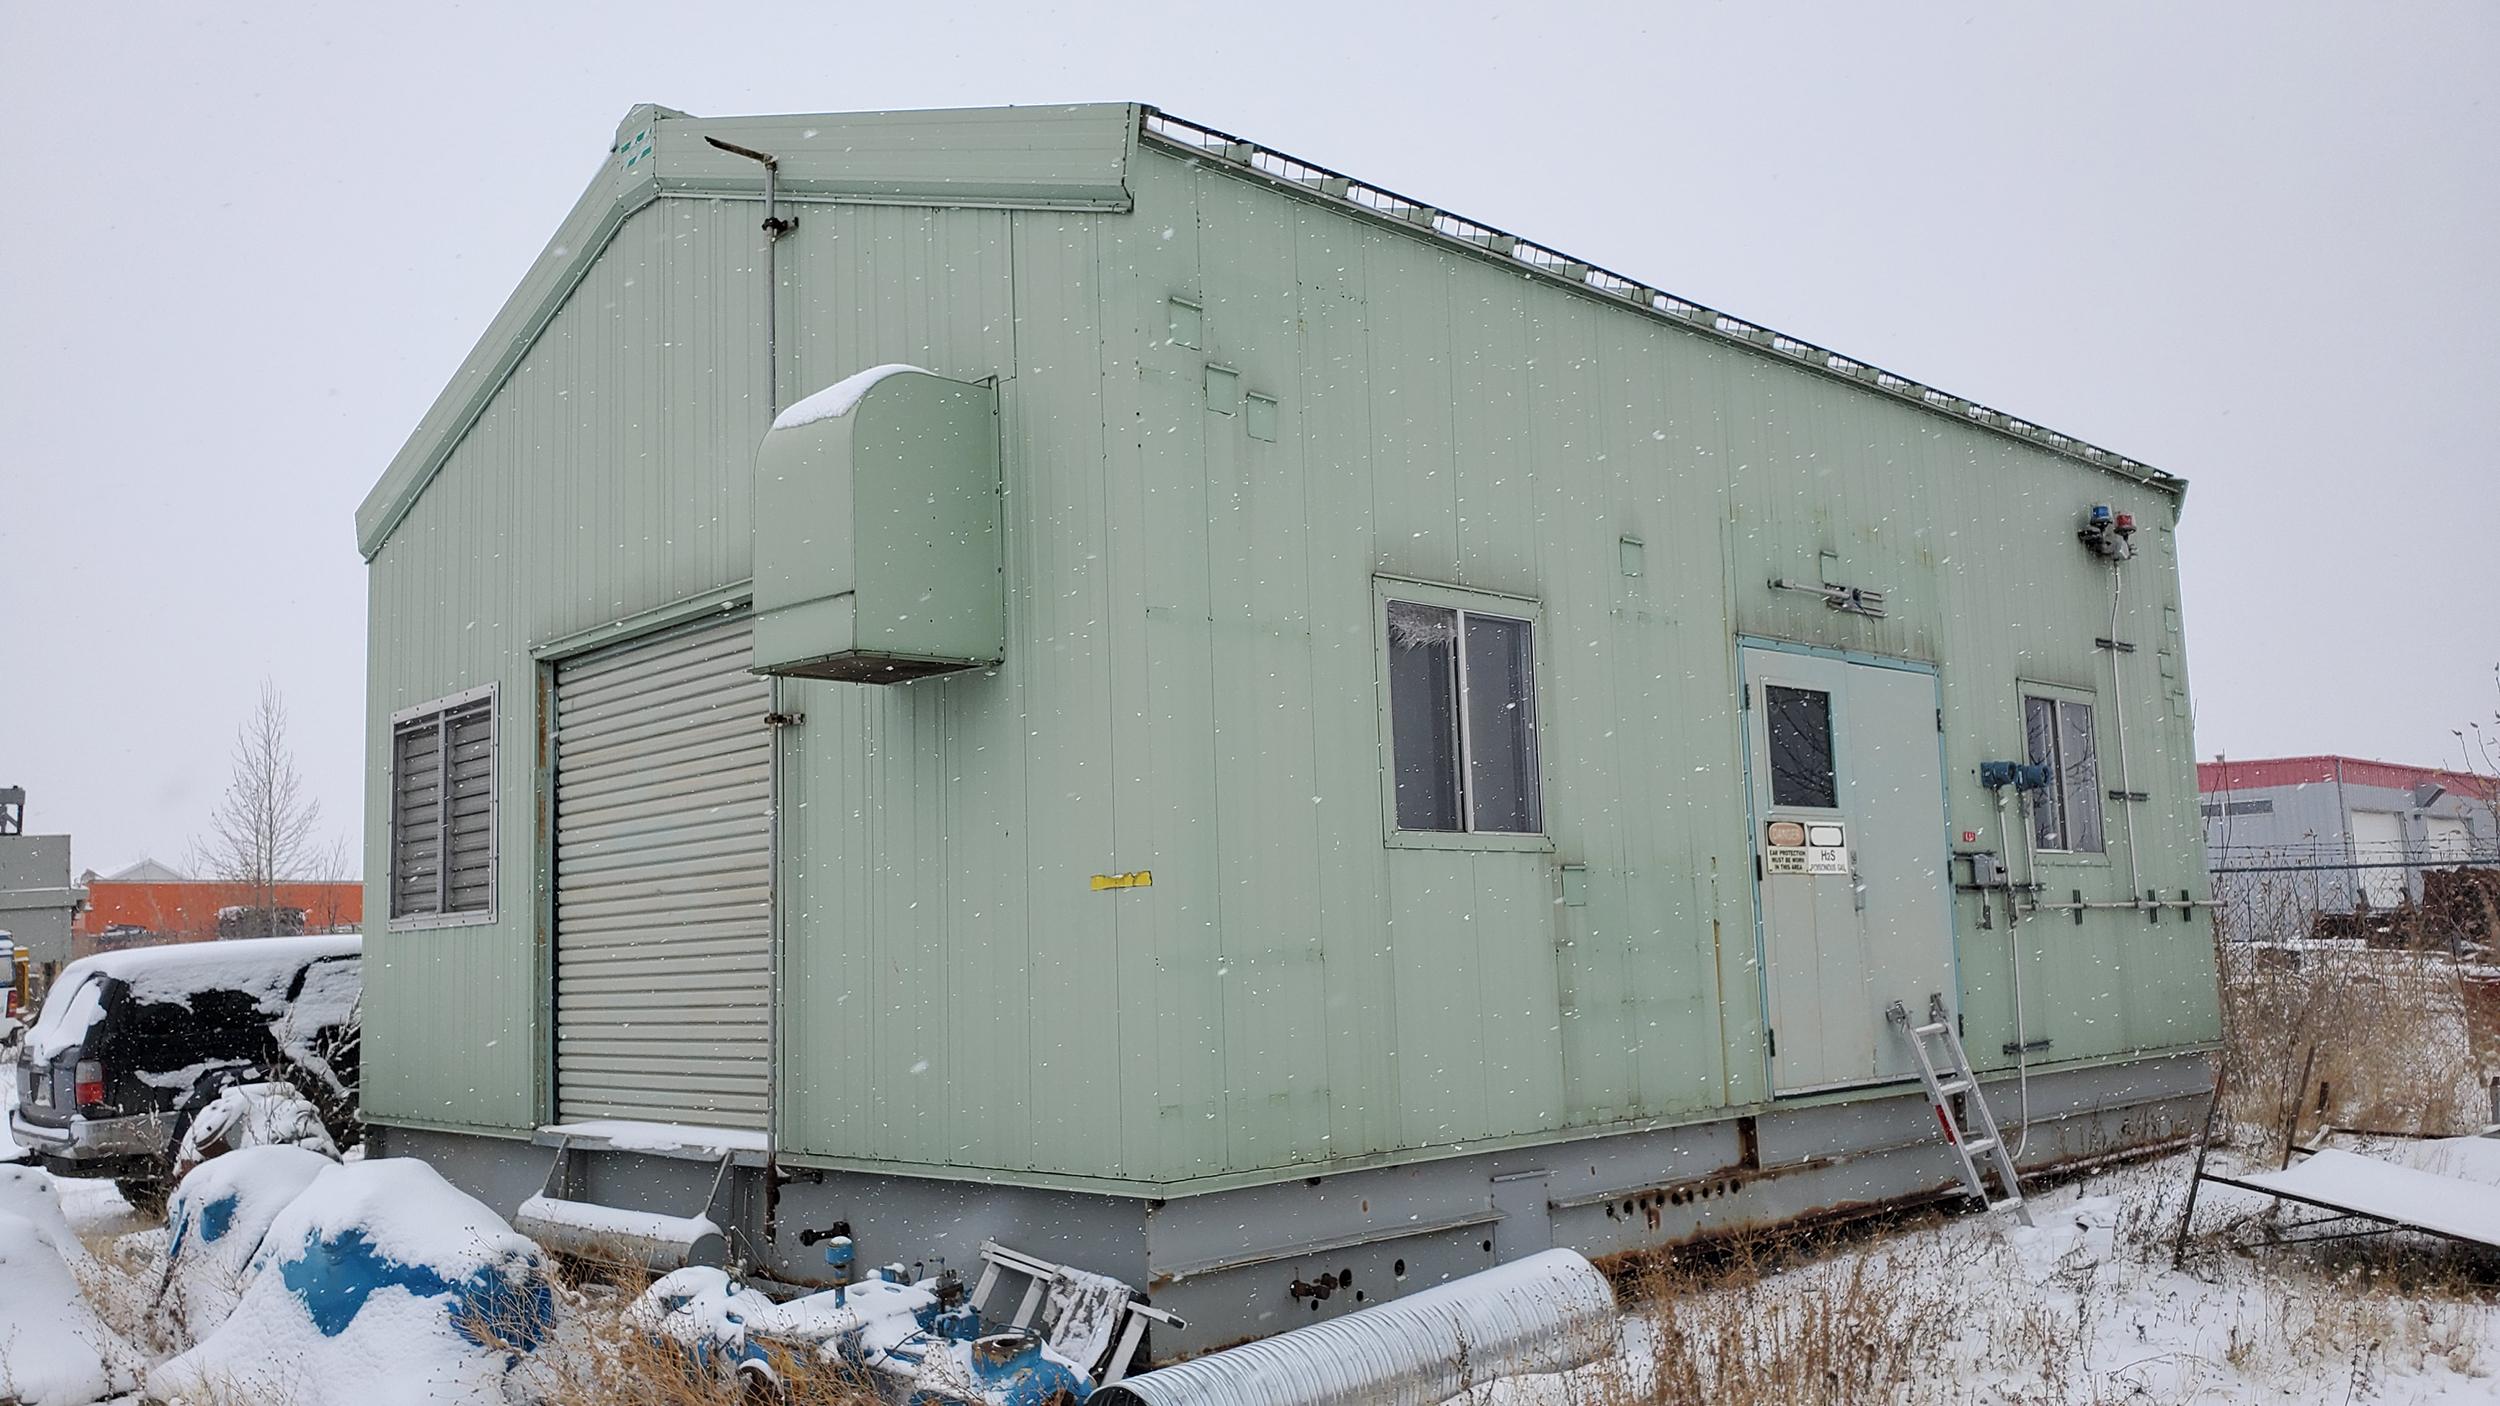 800HP 22% Sour Electric Reciprocating Compressor - exterior 1